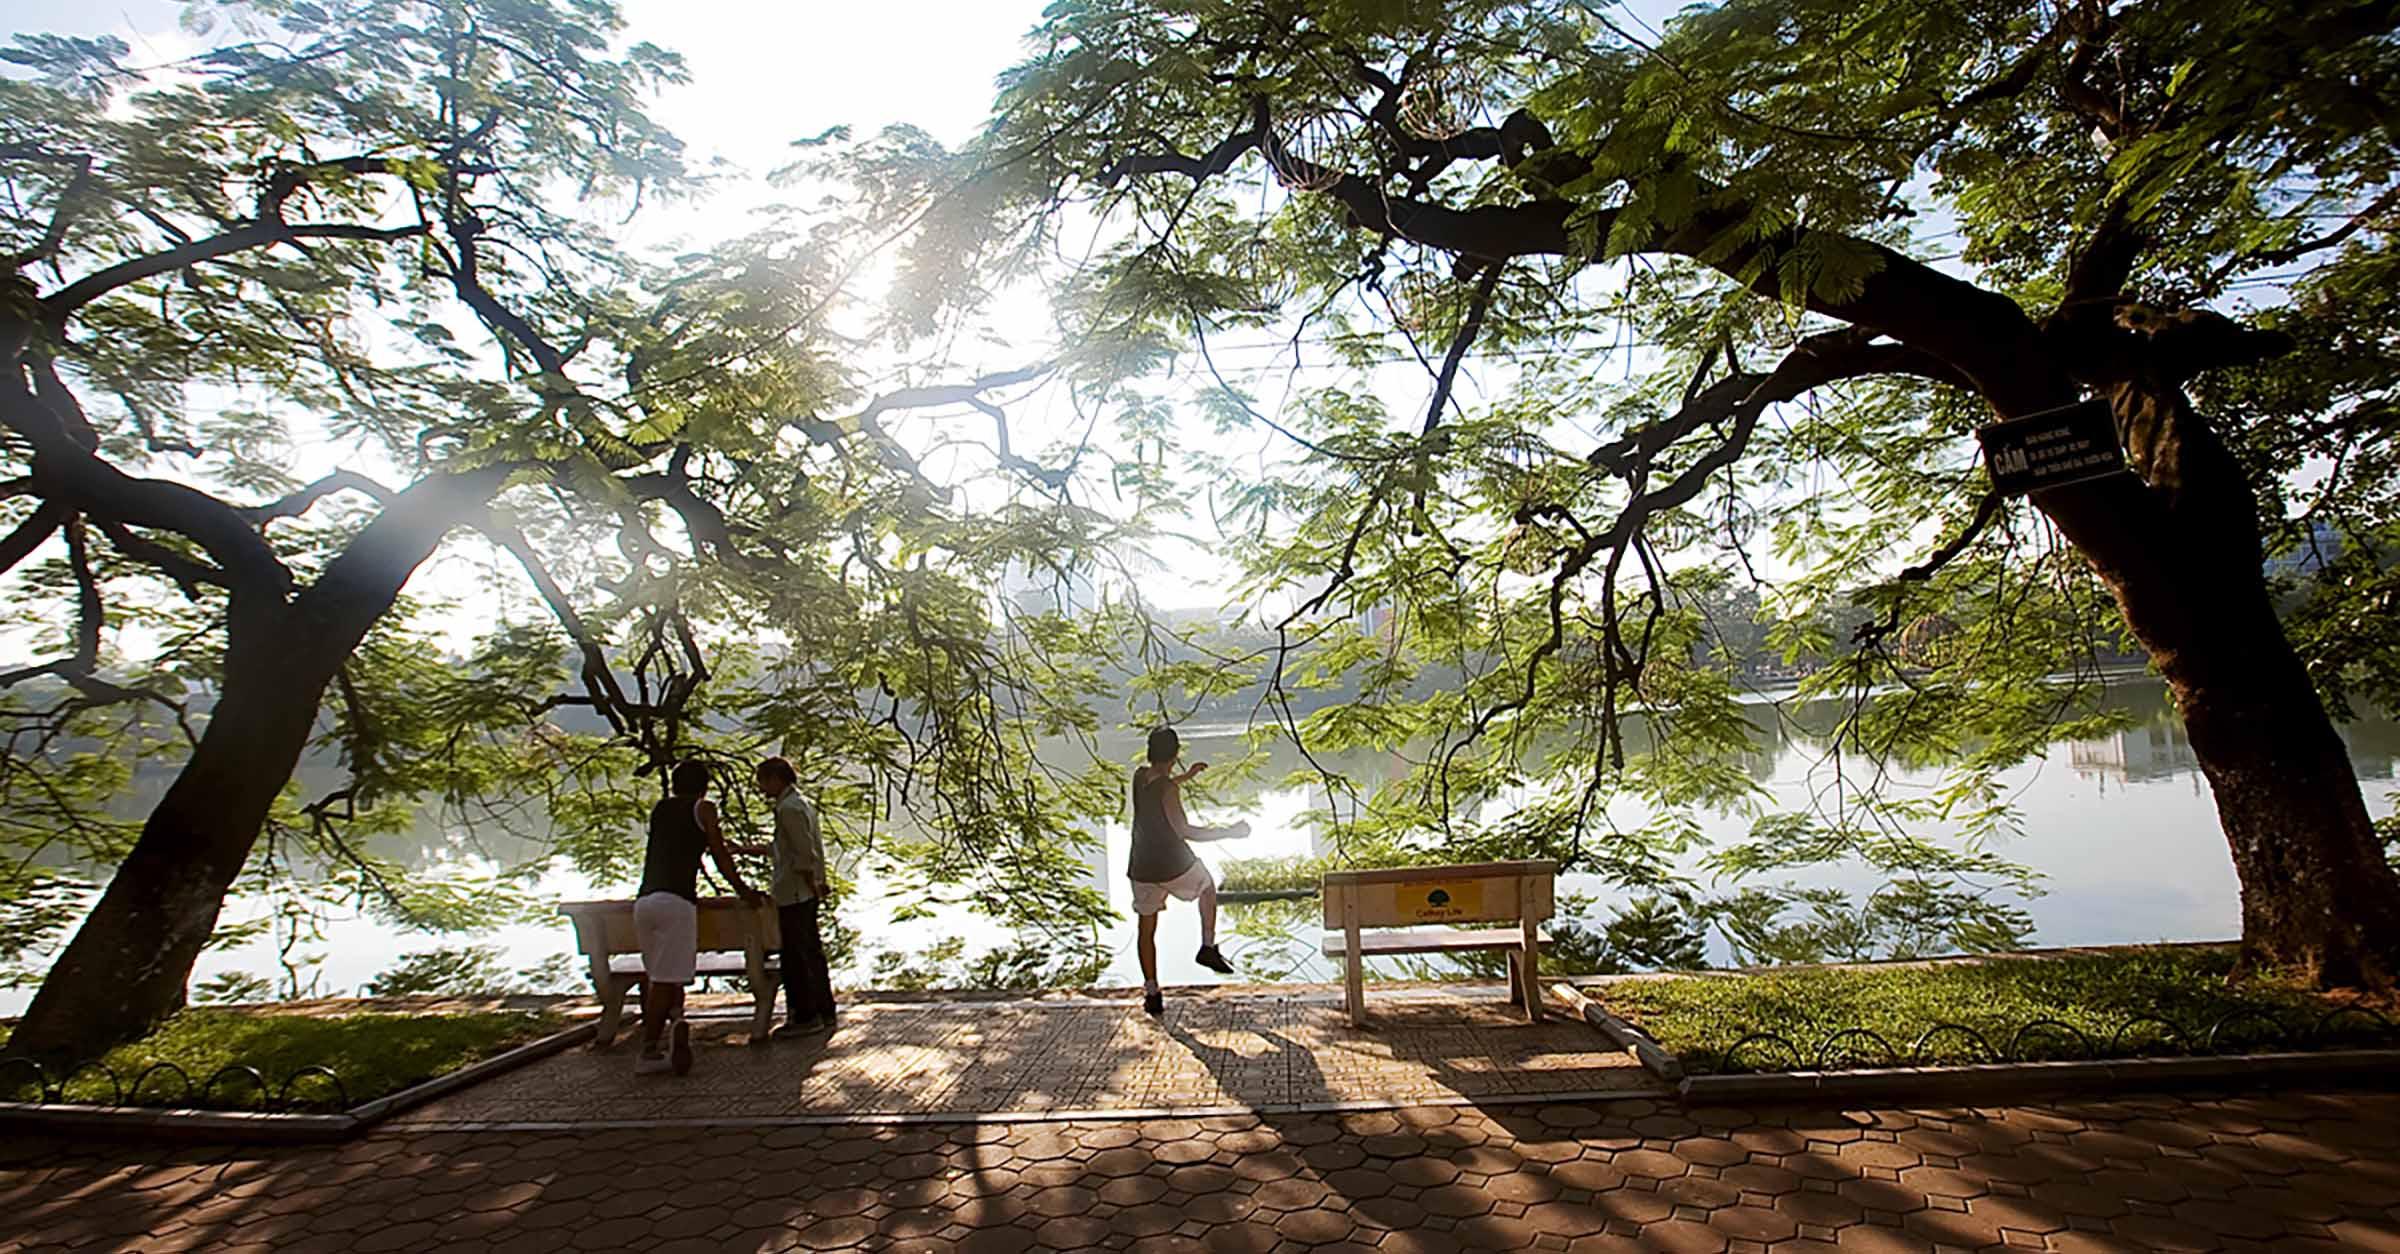 Hanoi tour in summer - Hoan Kiem Lake